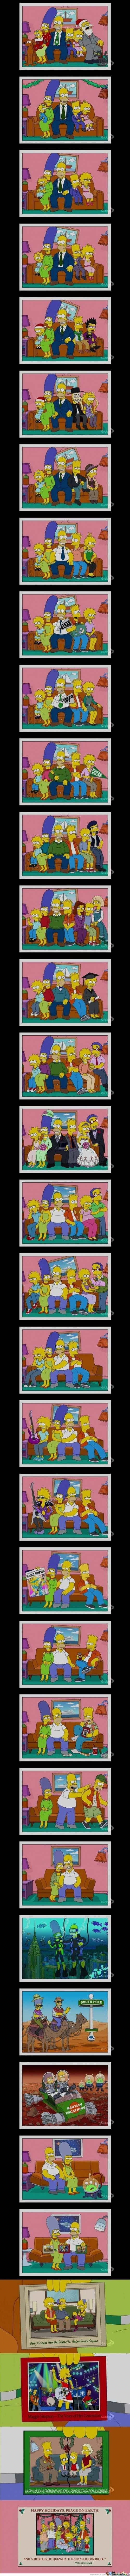 Simpsons Through Time